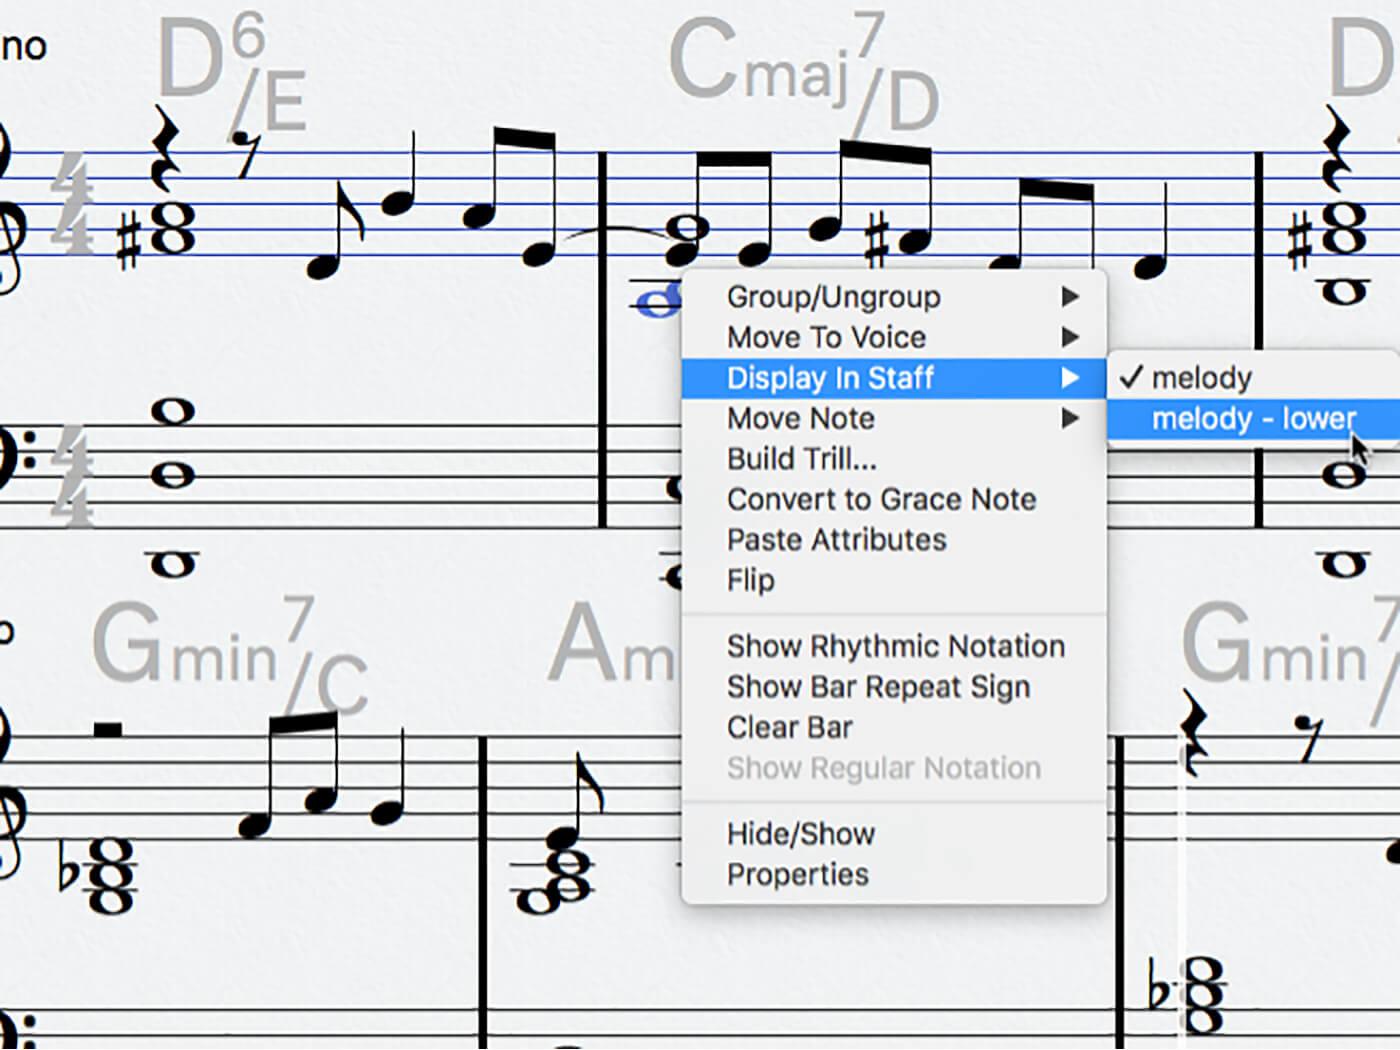 MT 205 Cubase Score Editor Step 17